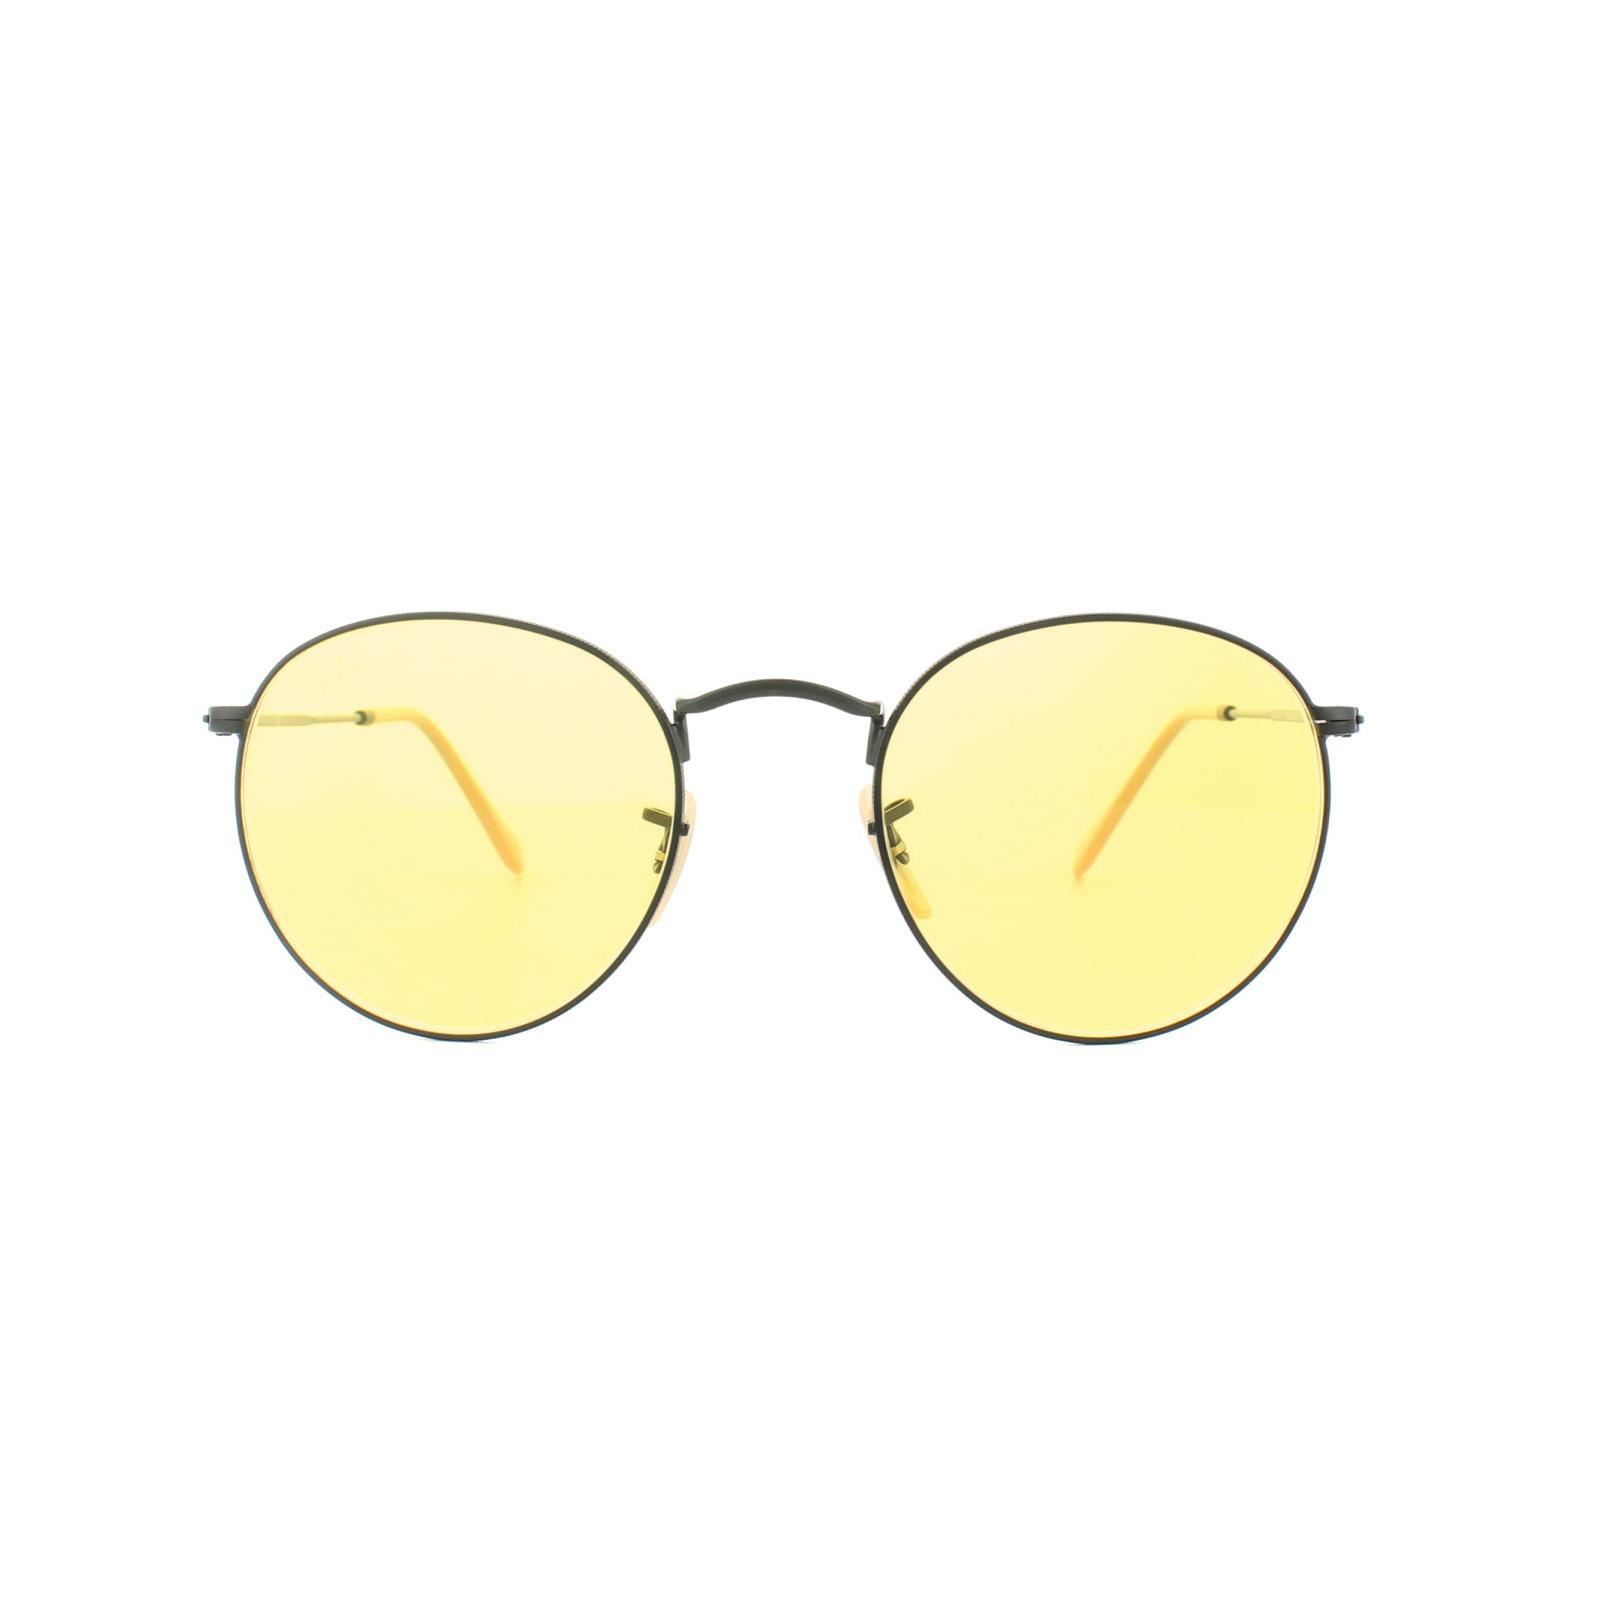 321d0866de4 Sentinel Ray-Ban Sunglasses Round Metal 3447 90664A Black Yellow  Photochromic Medium 50mm